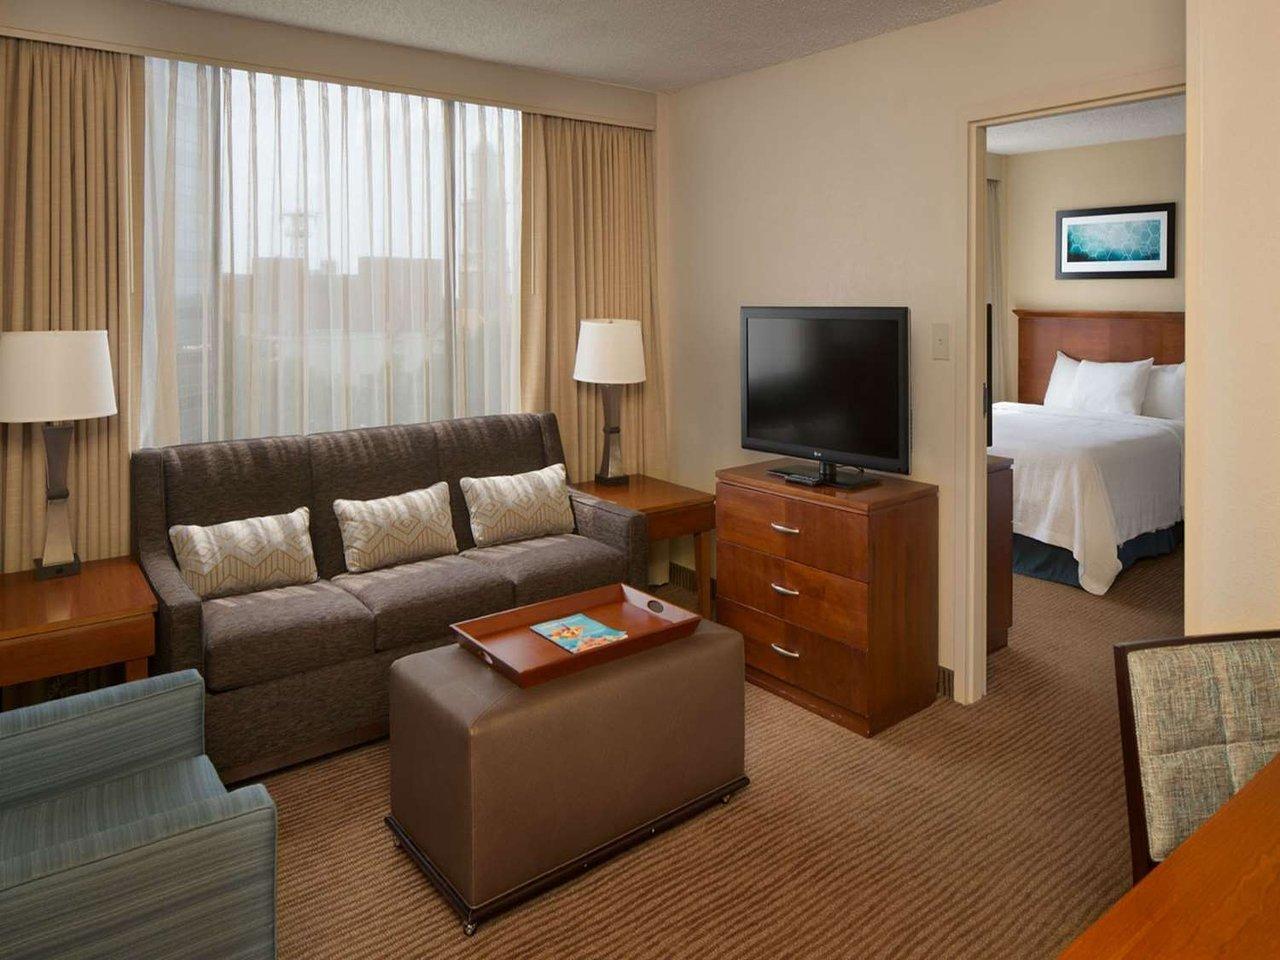 Room Attendant at Embassy Suites by Hilton Winston Salem | HVMG